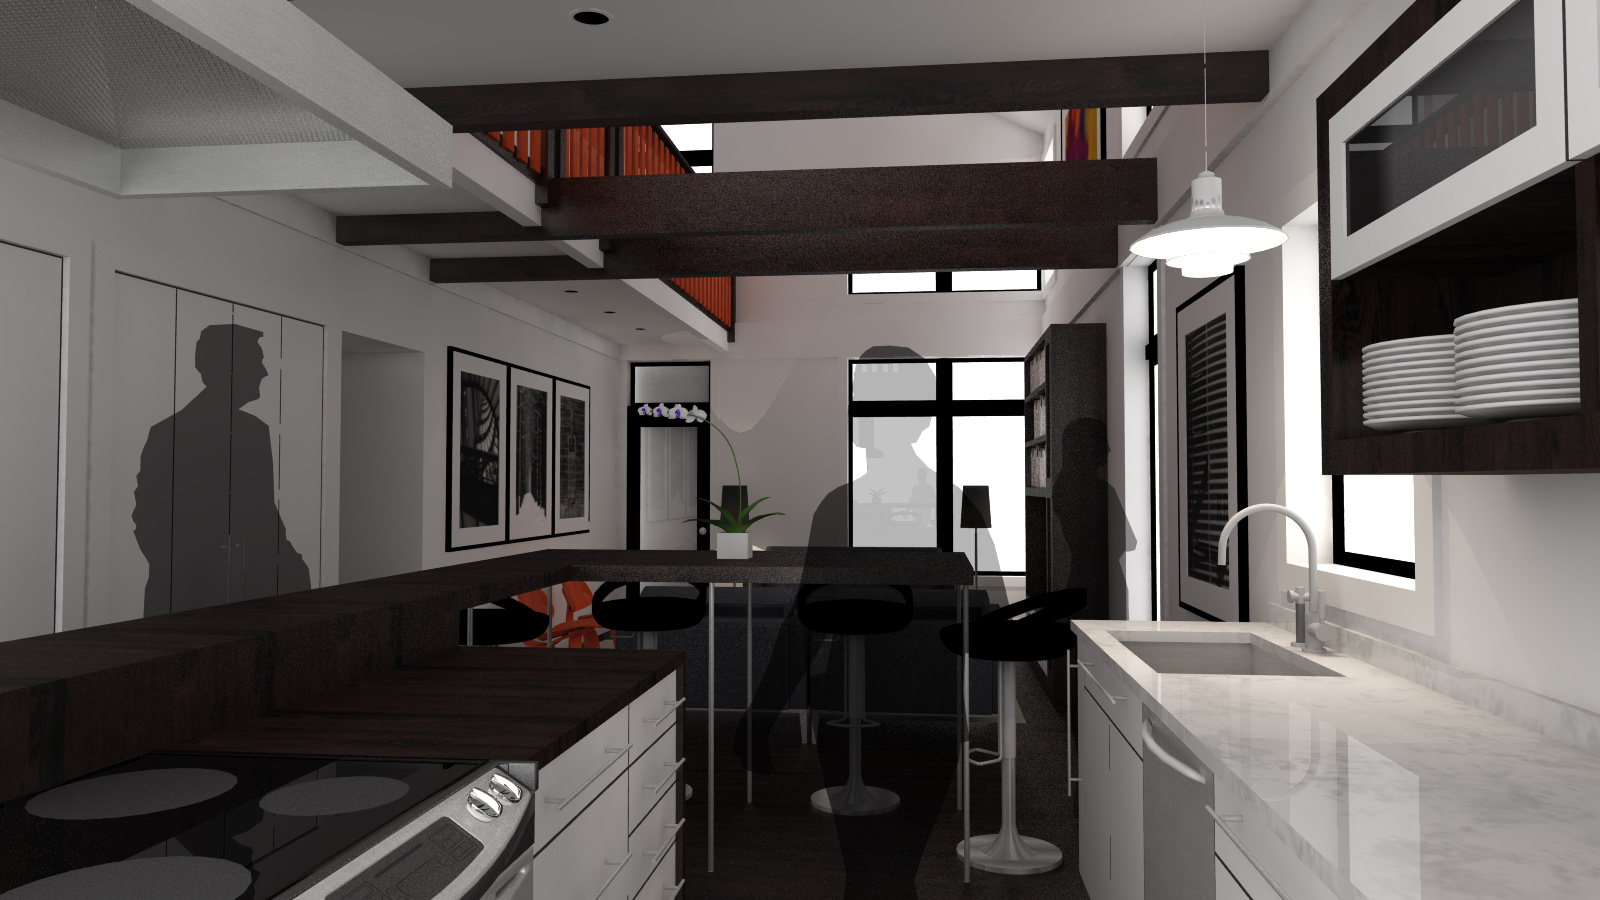 5_interiorview_2.jpg